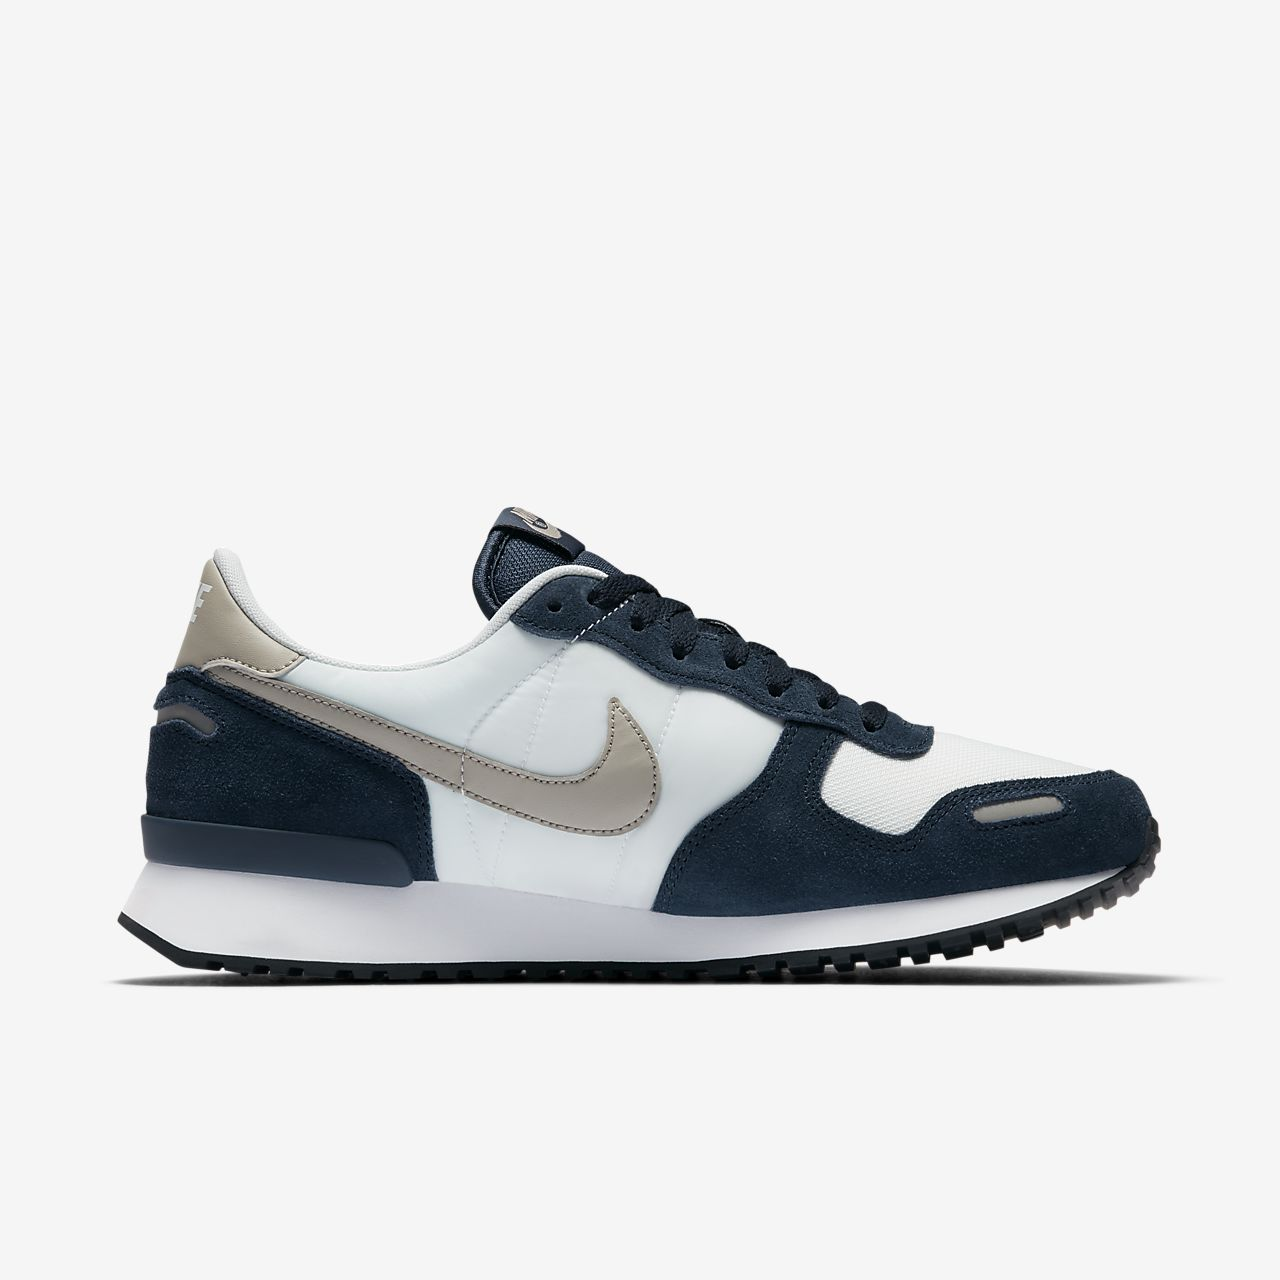 Low Resolution Nike Air Vortex Men's Shoe Nike Air Vortex Men's Shoe